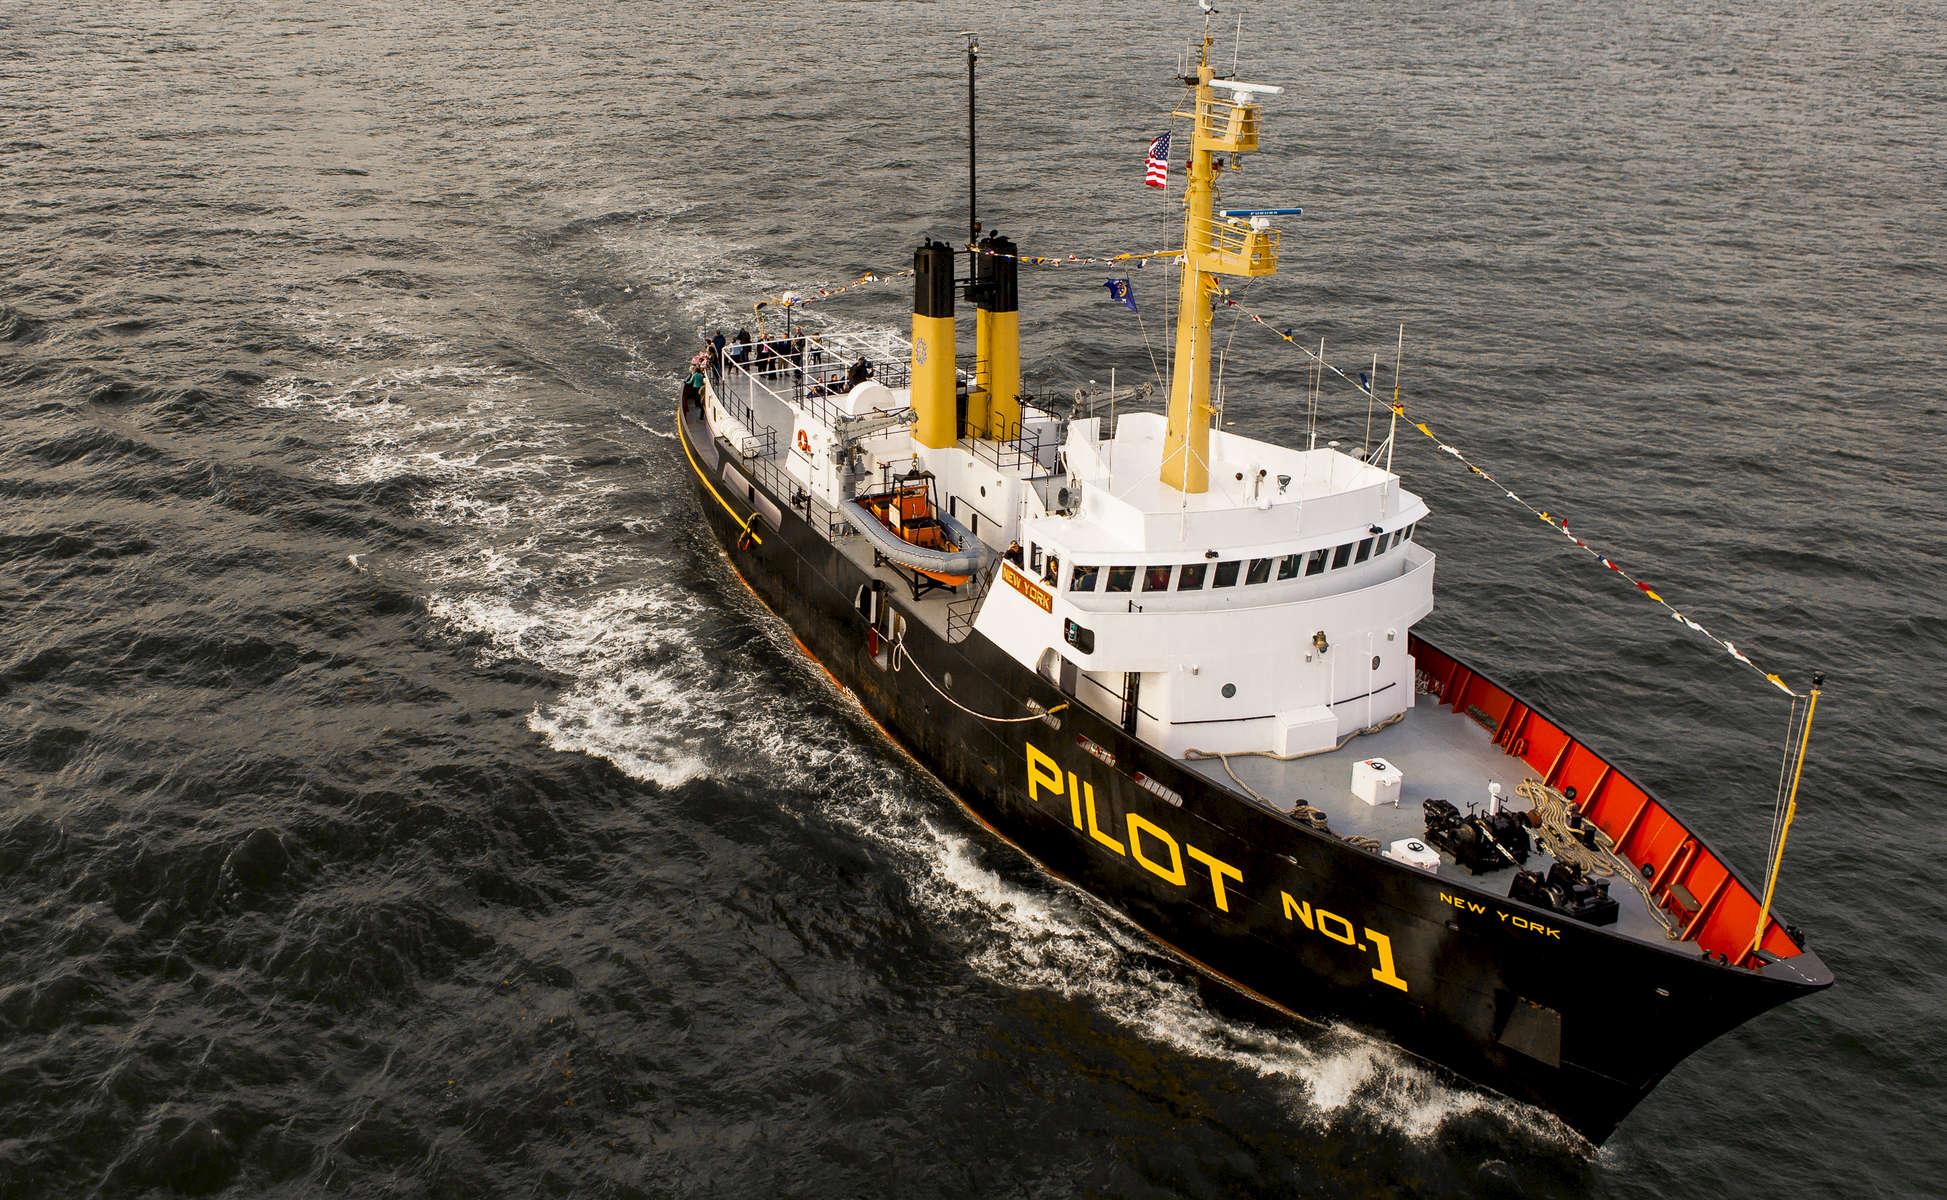 USS NEW YORK ARRIVES NYC